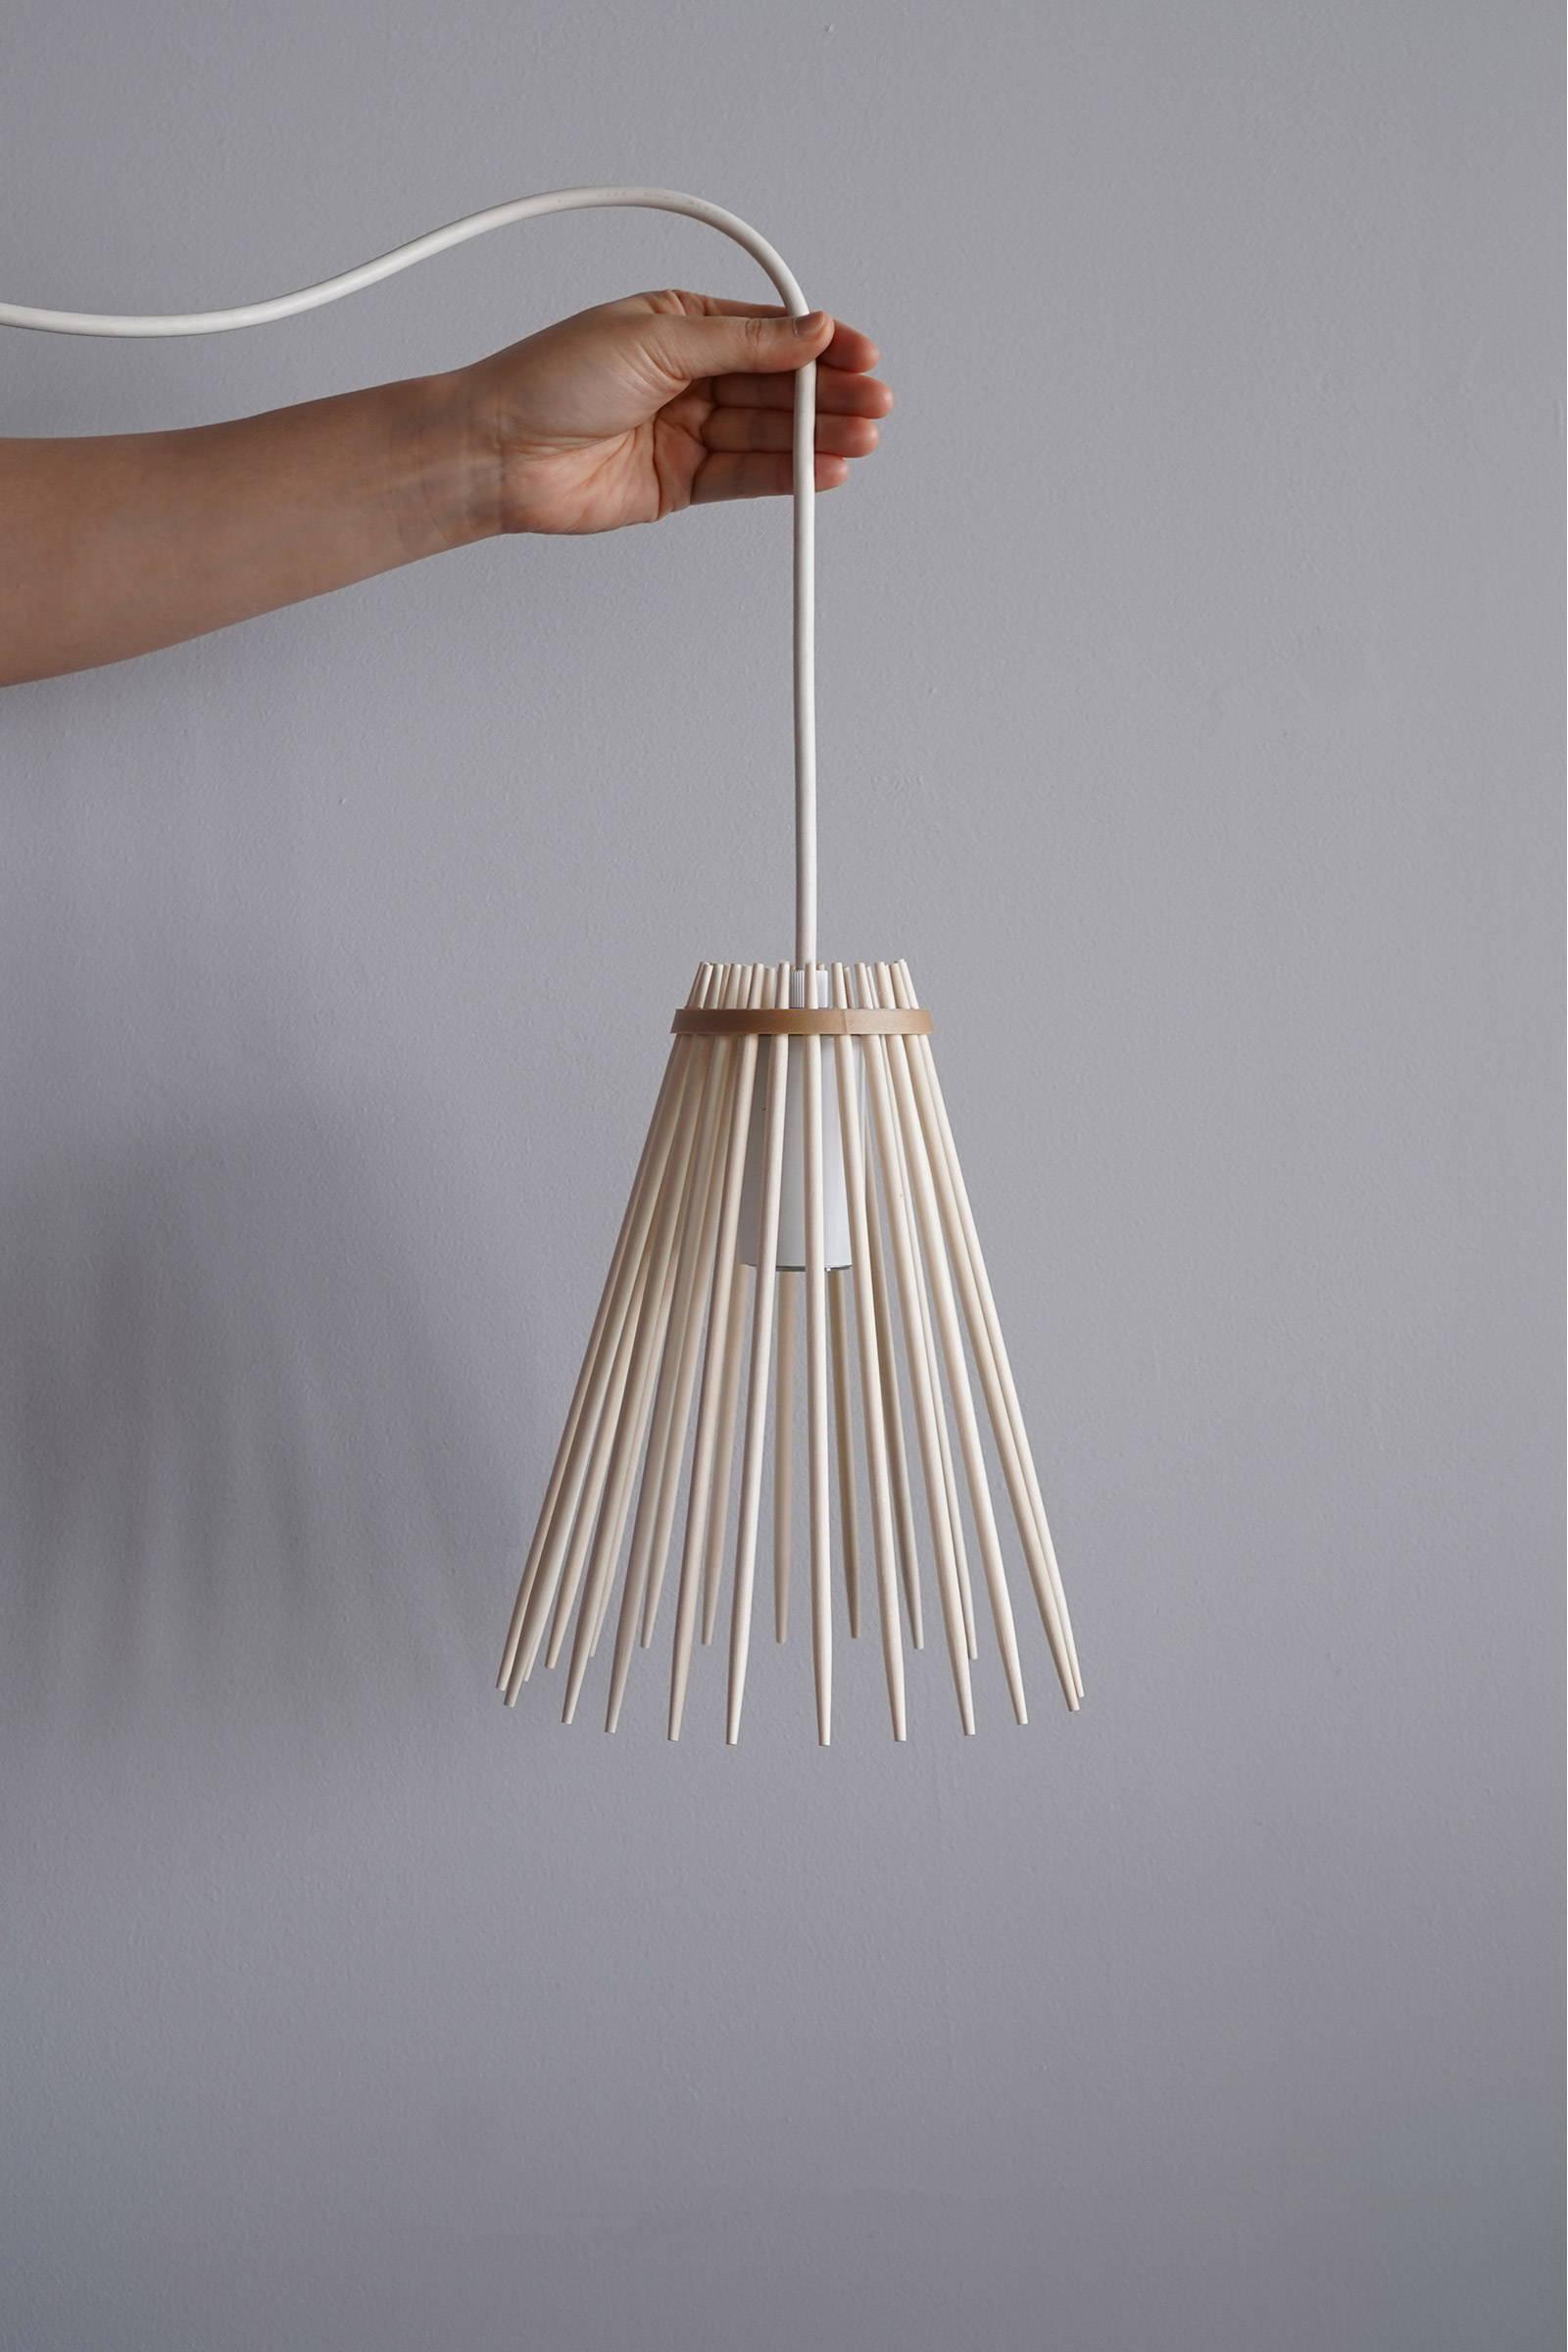 Disposable chopstick lampshade by Keiji Ashizawa Design